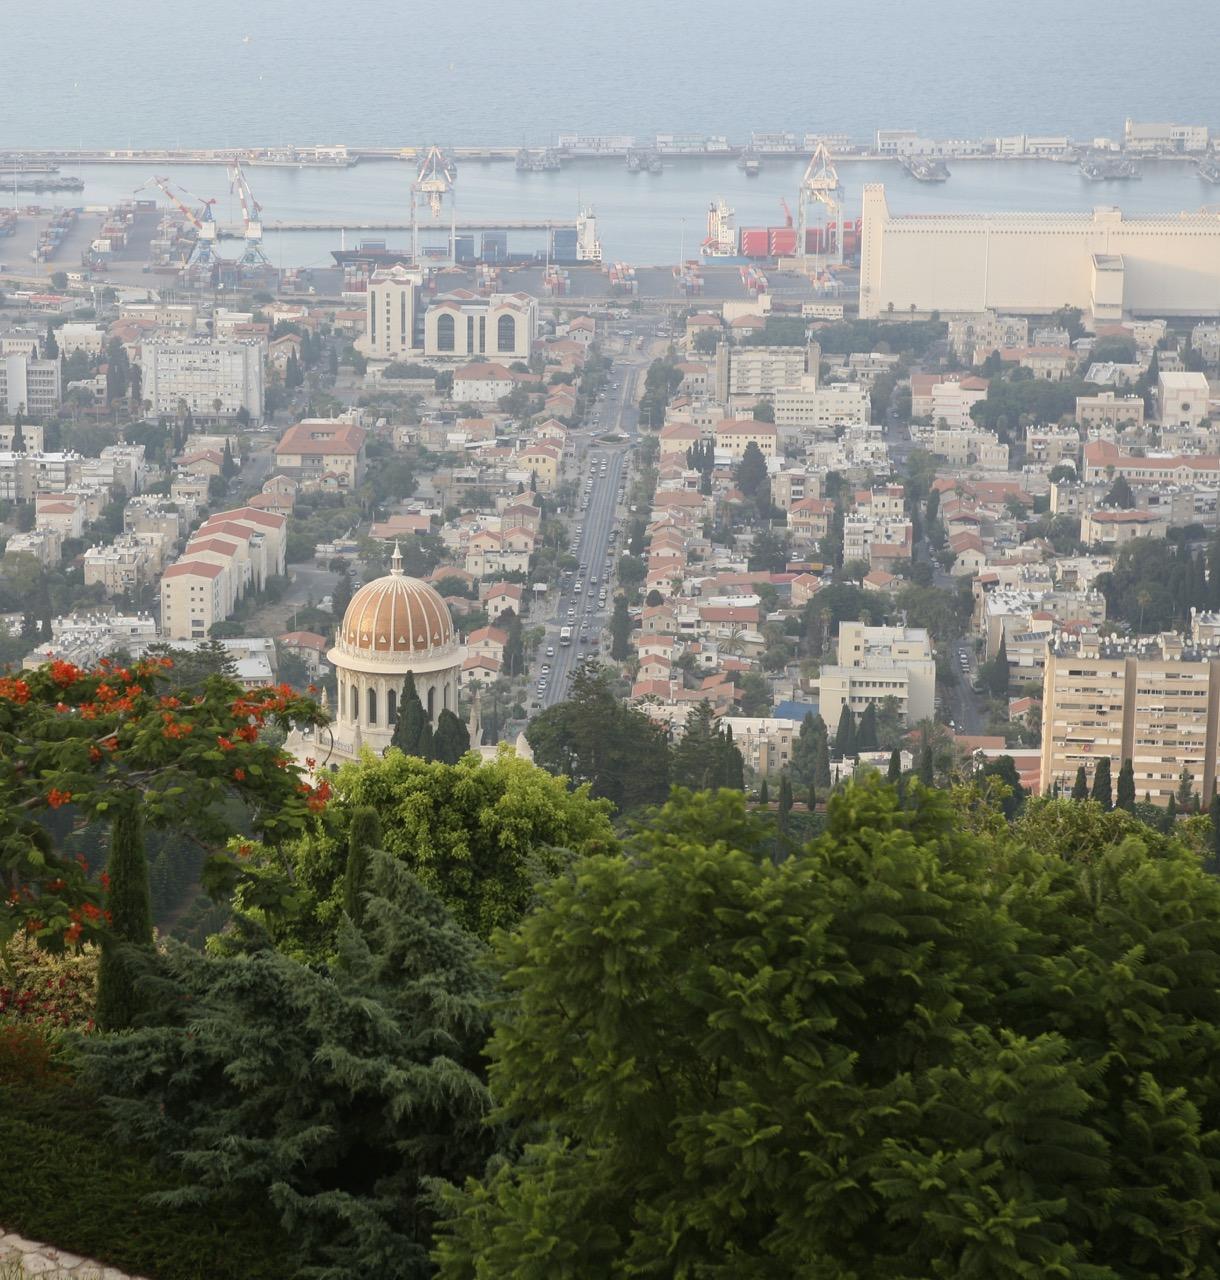 thegoodgarden|bahaitemple|haifa|davidcalle1349.JPG.jpg